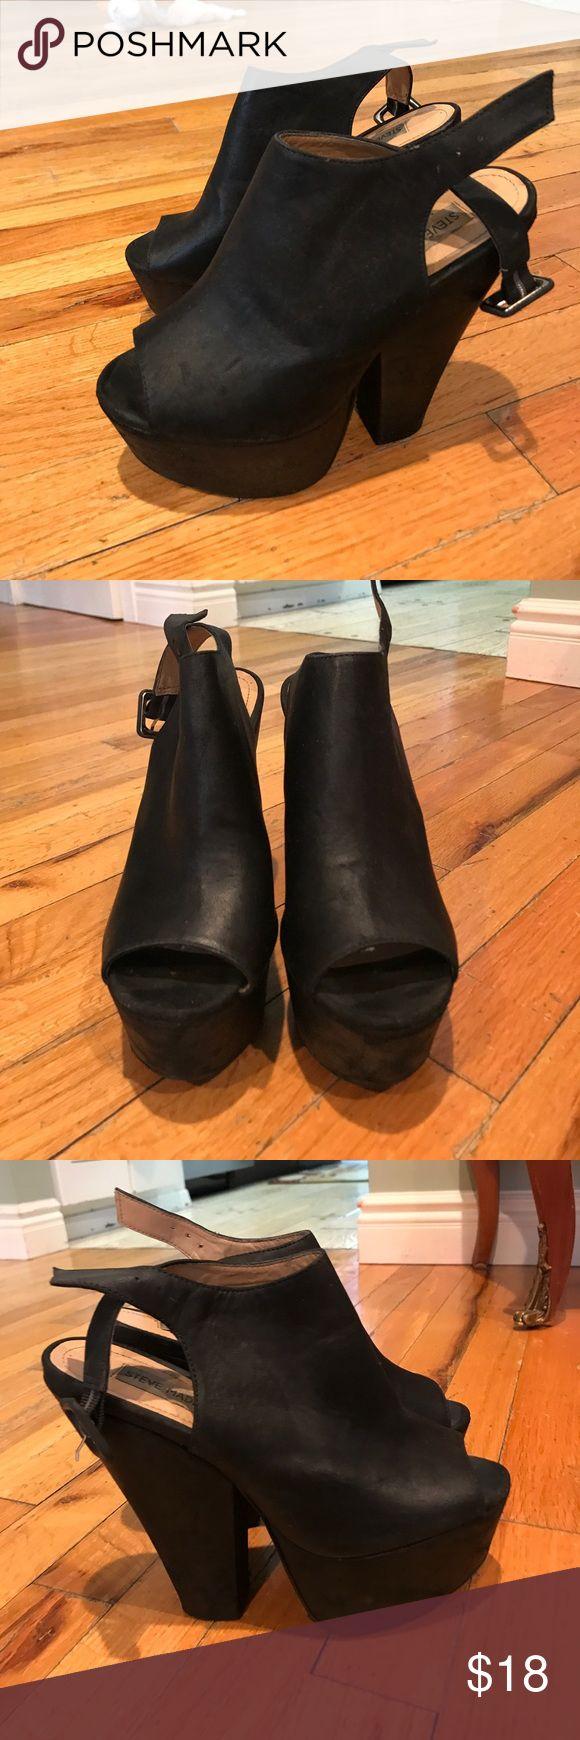 Steve Madden open toe black heels Black leather open toe heels Steve Madden Shoes Heels